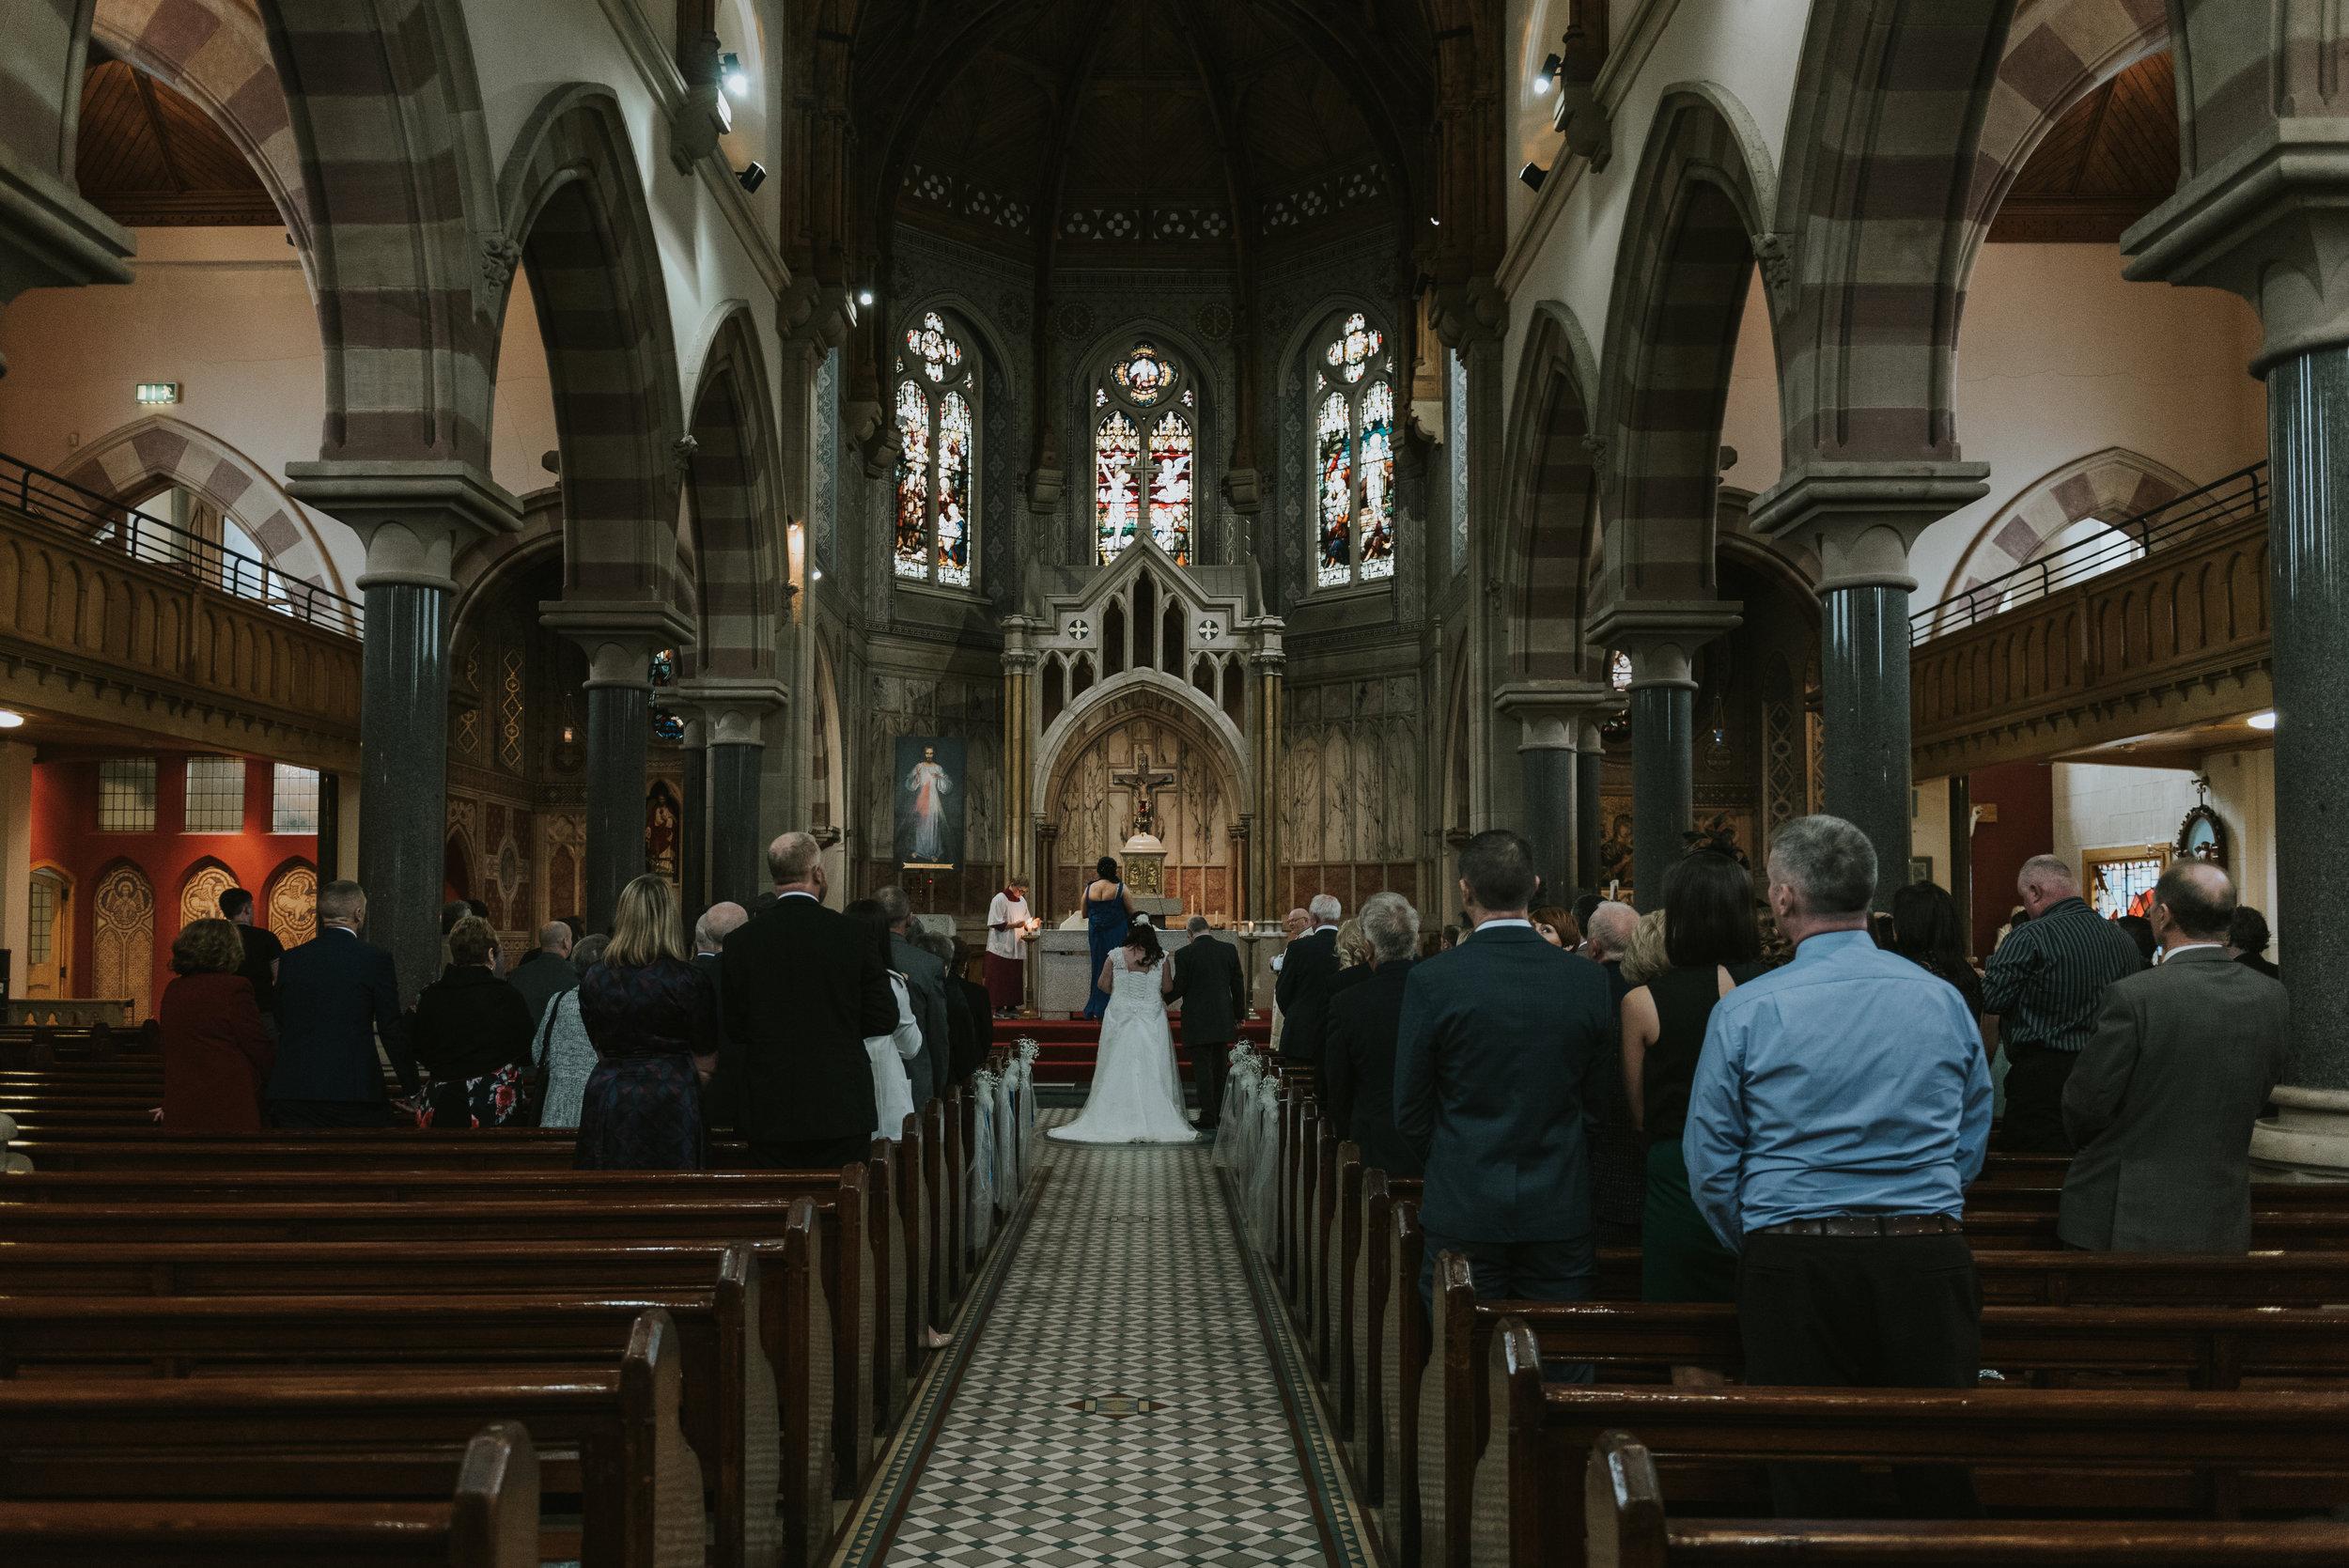 St. Pauls belfast wedding photographer pure photo n.i